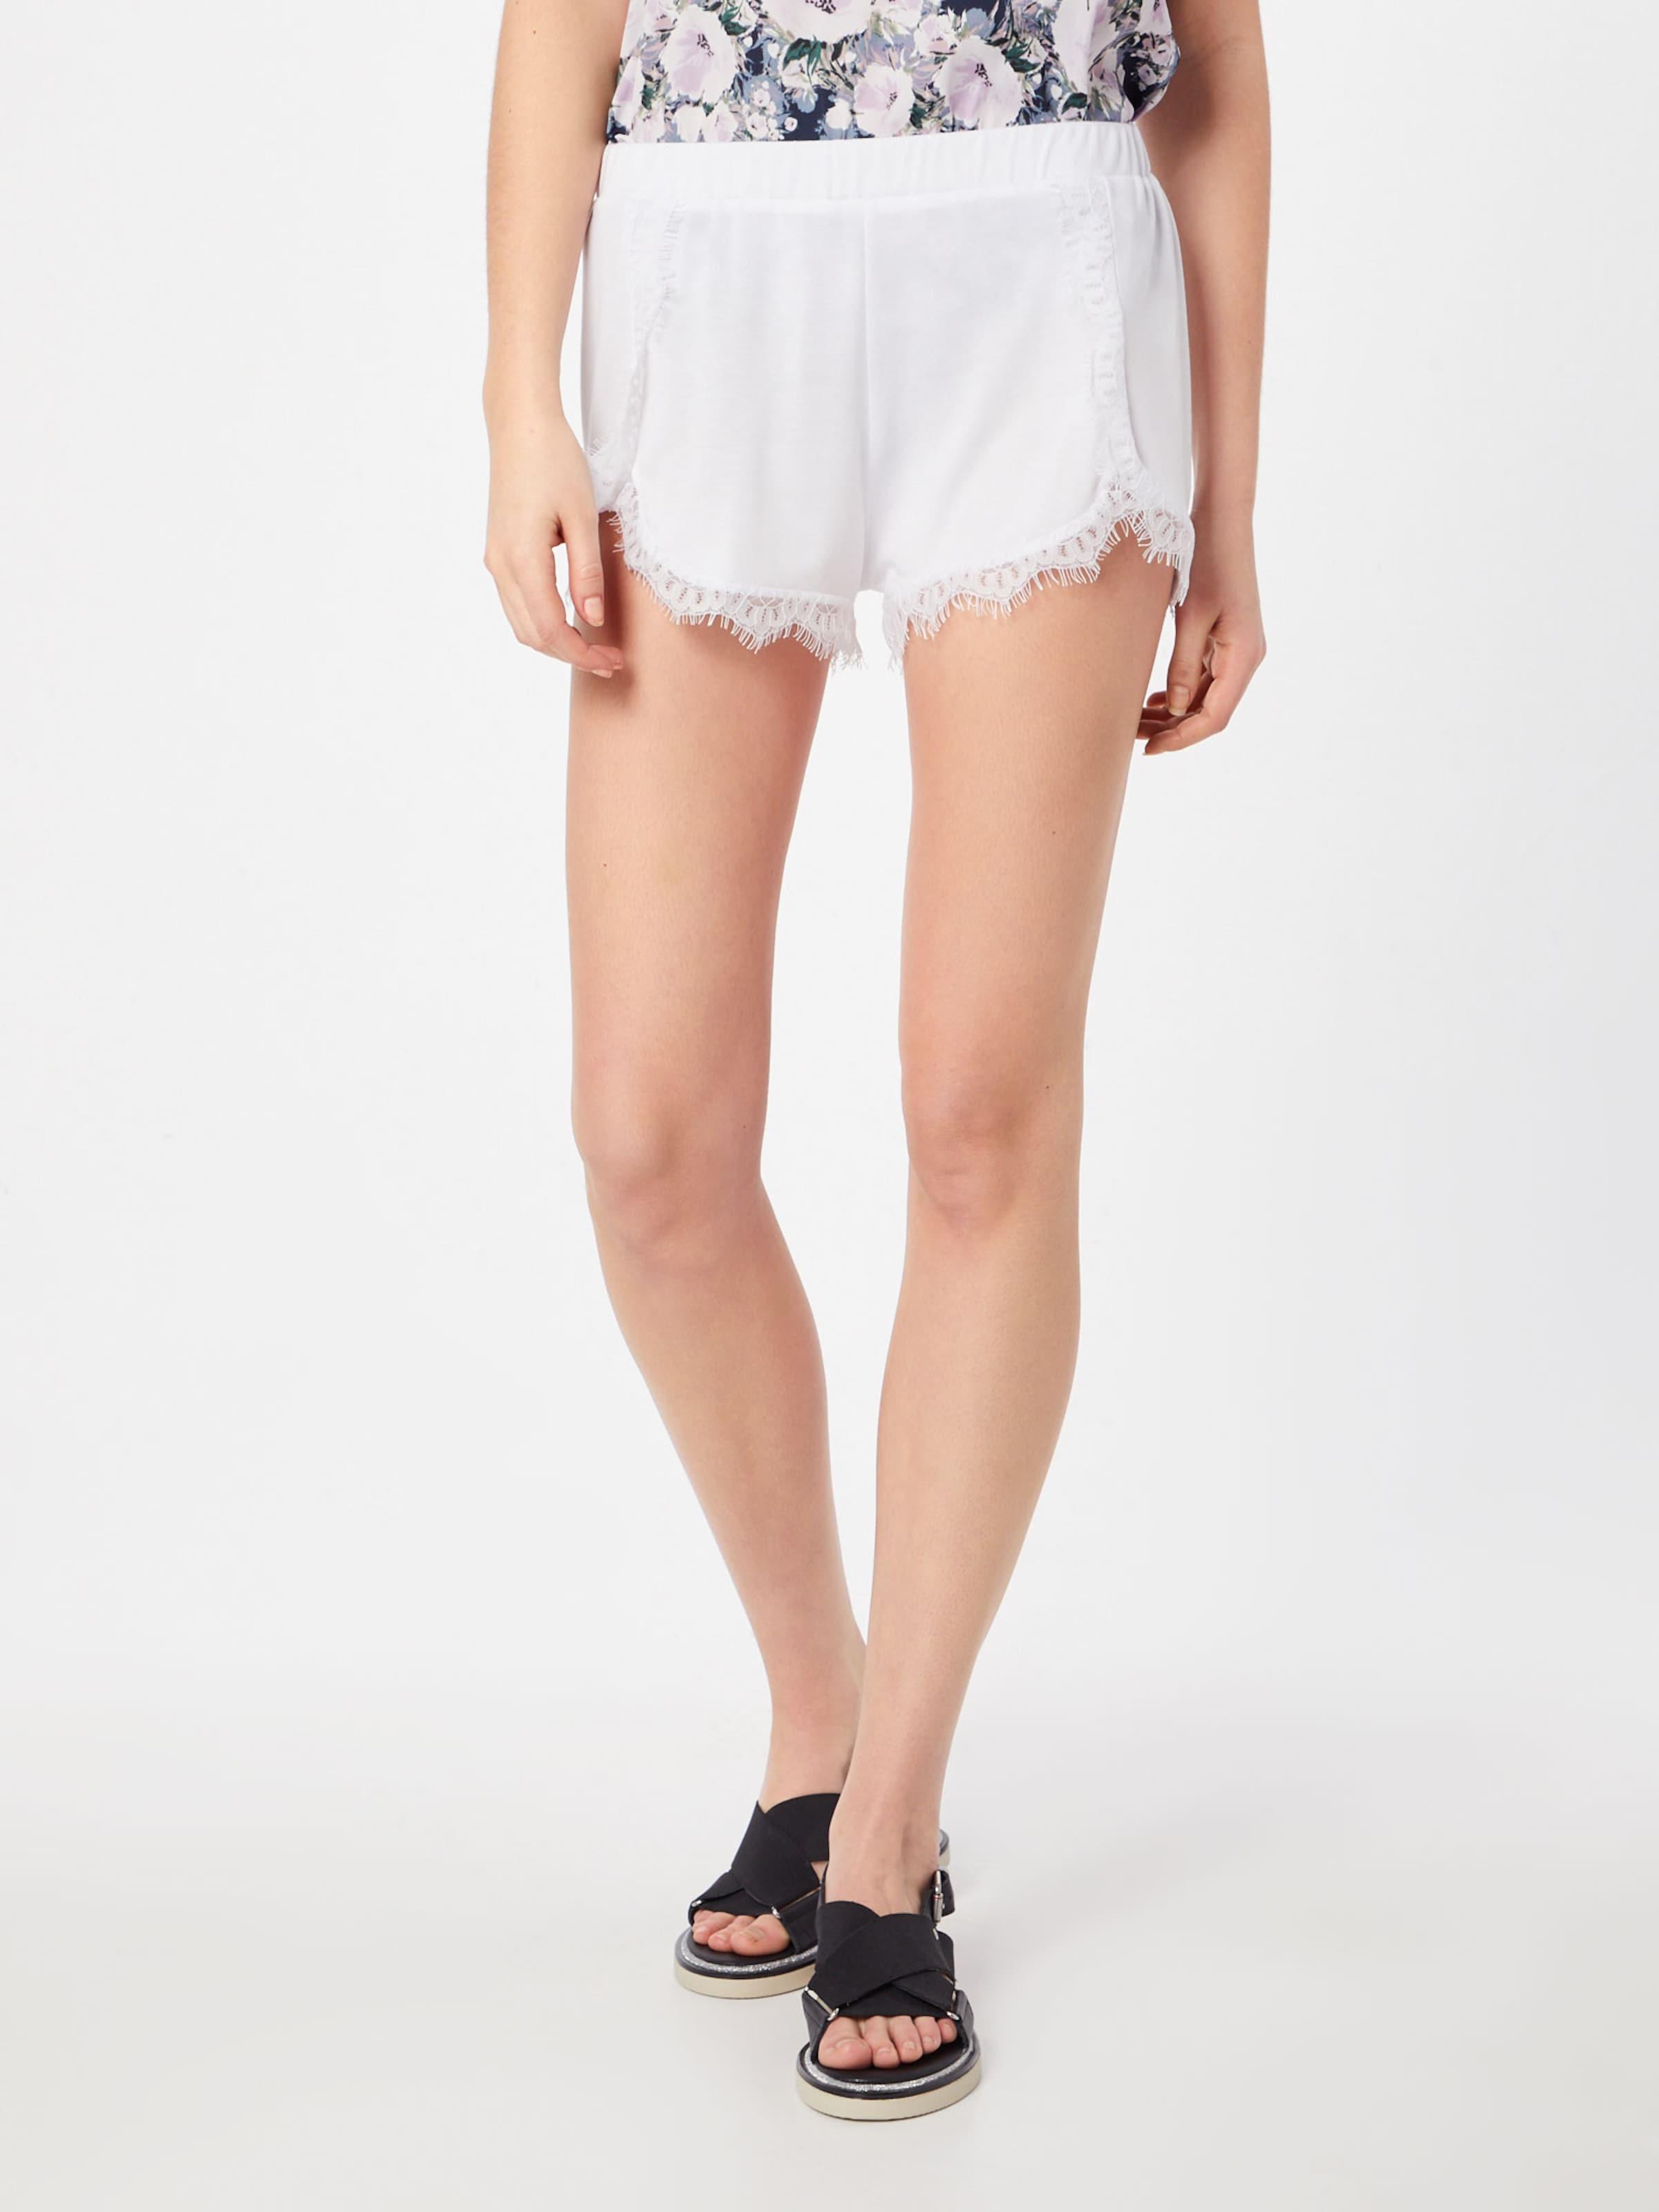 Shorts' En kd Detailed Lace Blanc Na Pantalon 'overlapped OTlPkXZiwu